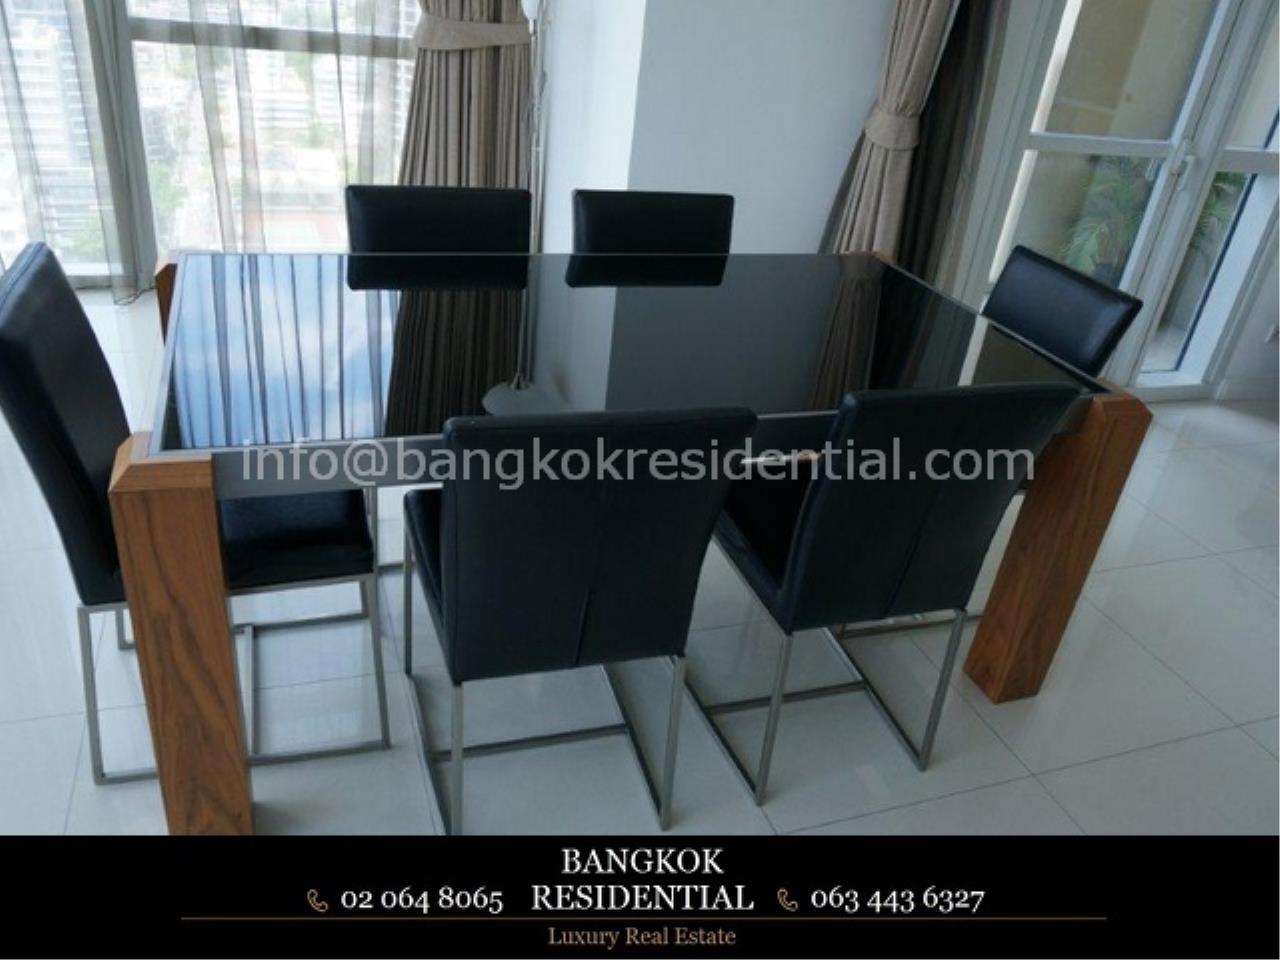 Bangkok Residential Agency's 3BR Athenee Residence For Sale Or Rent (BR3386CD) 4